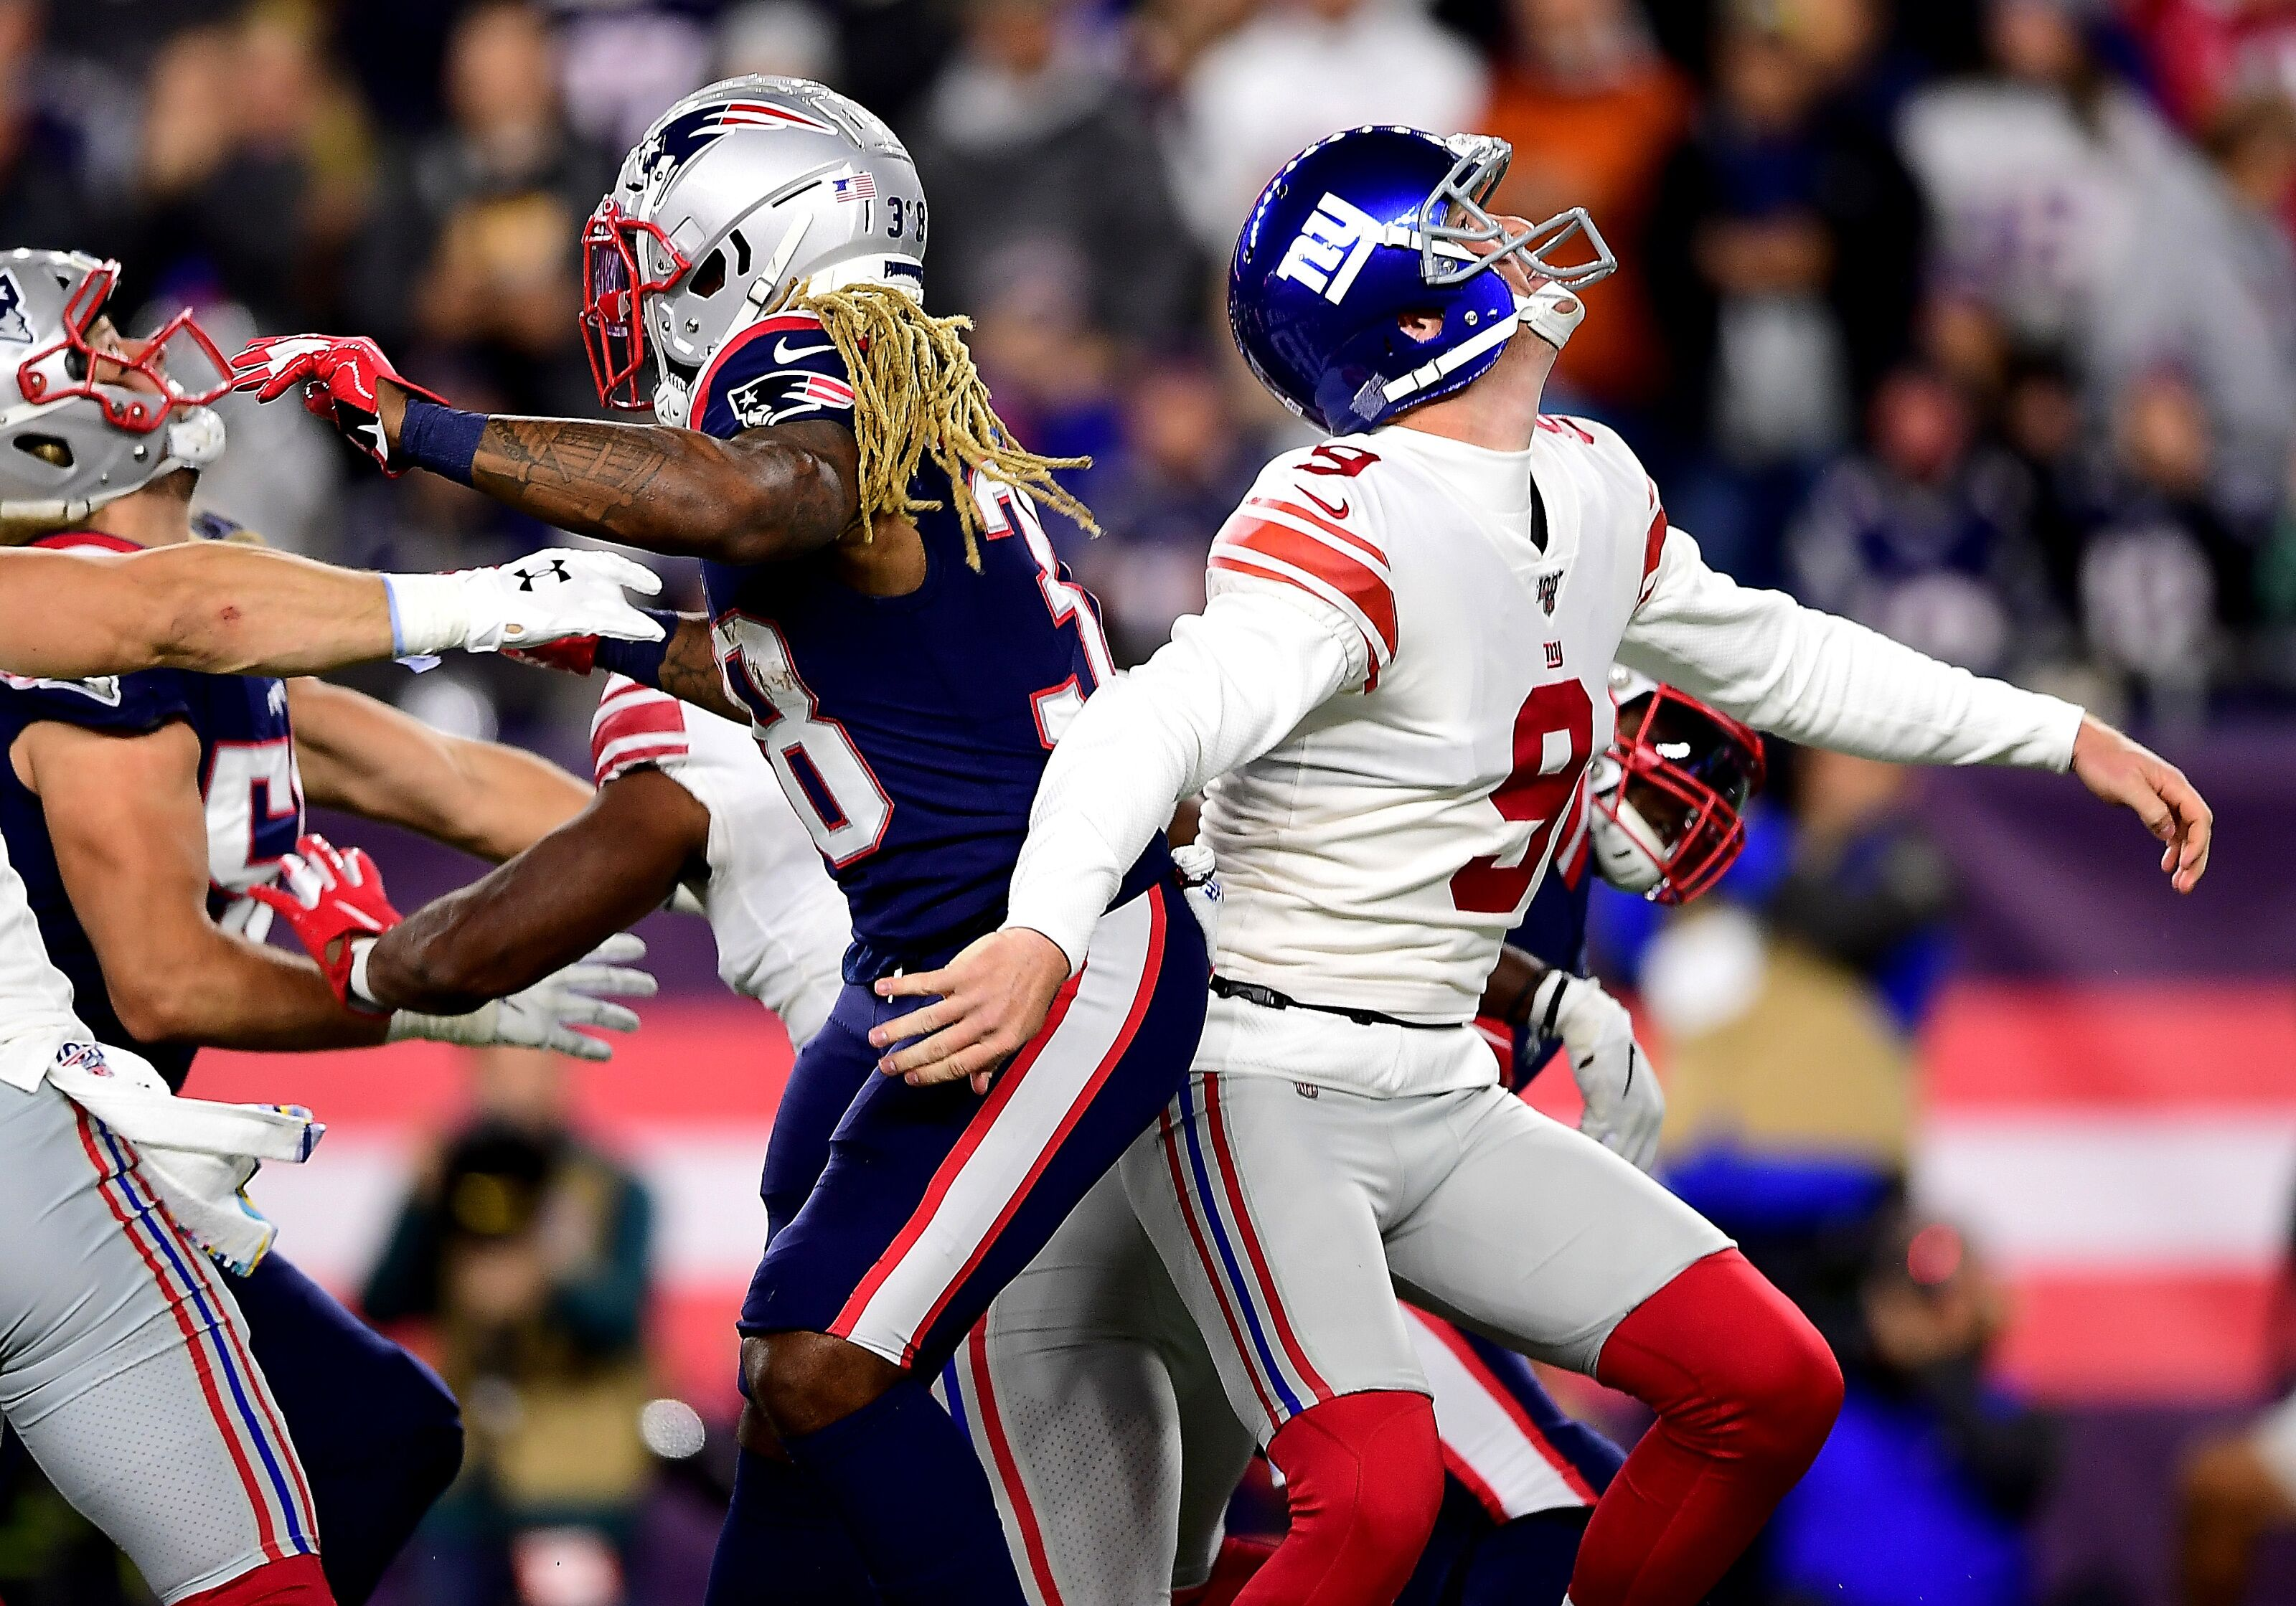 Syracuse Football: Riley Dixon struggles, Orange alum NFL update